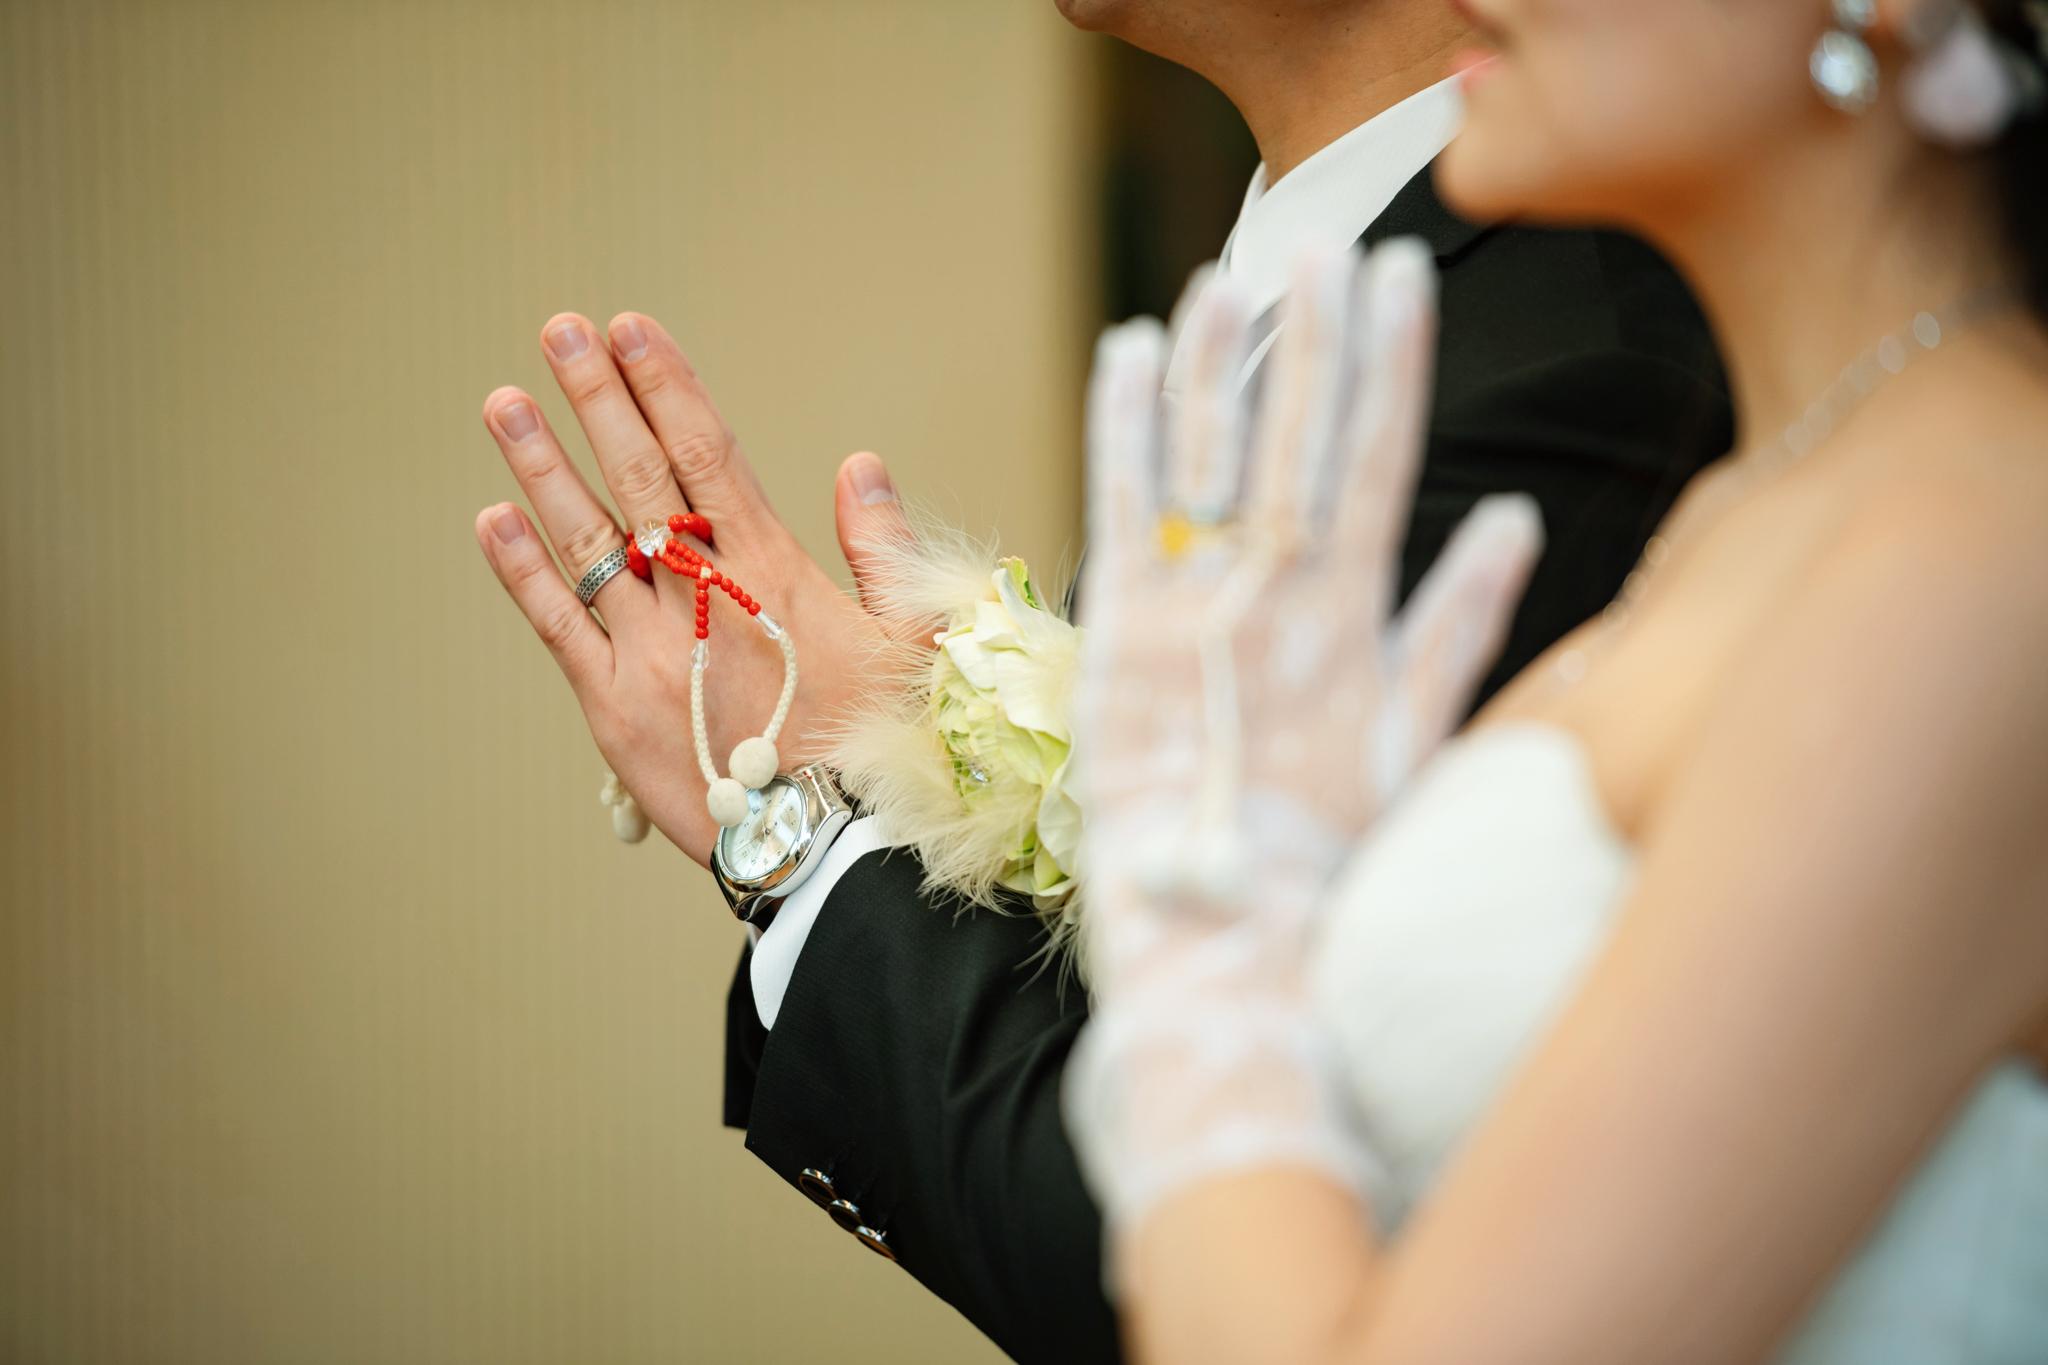 EASTERN WEDDING, 東法, Donfer, 婚禮紀錄, EW, 藝術婚禮, 台北婚攝